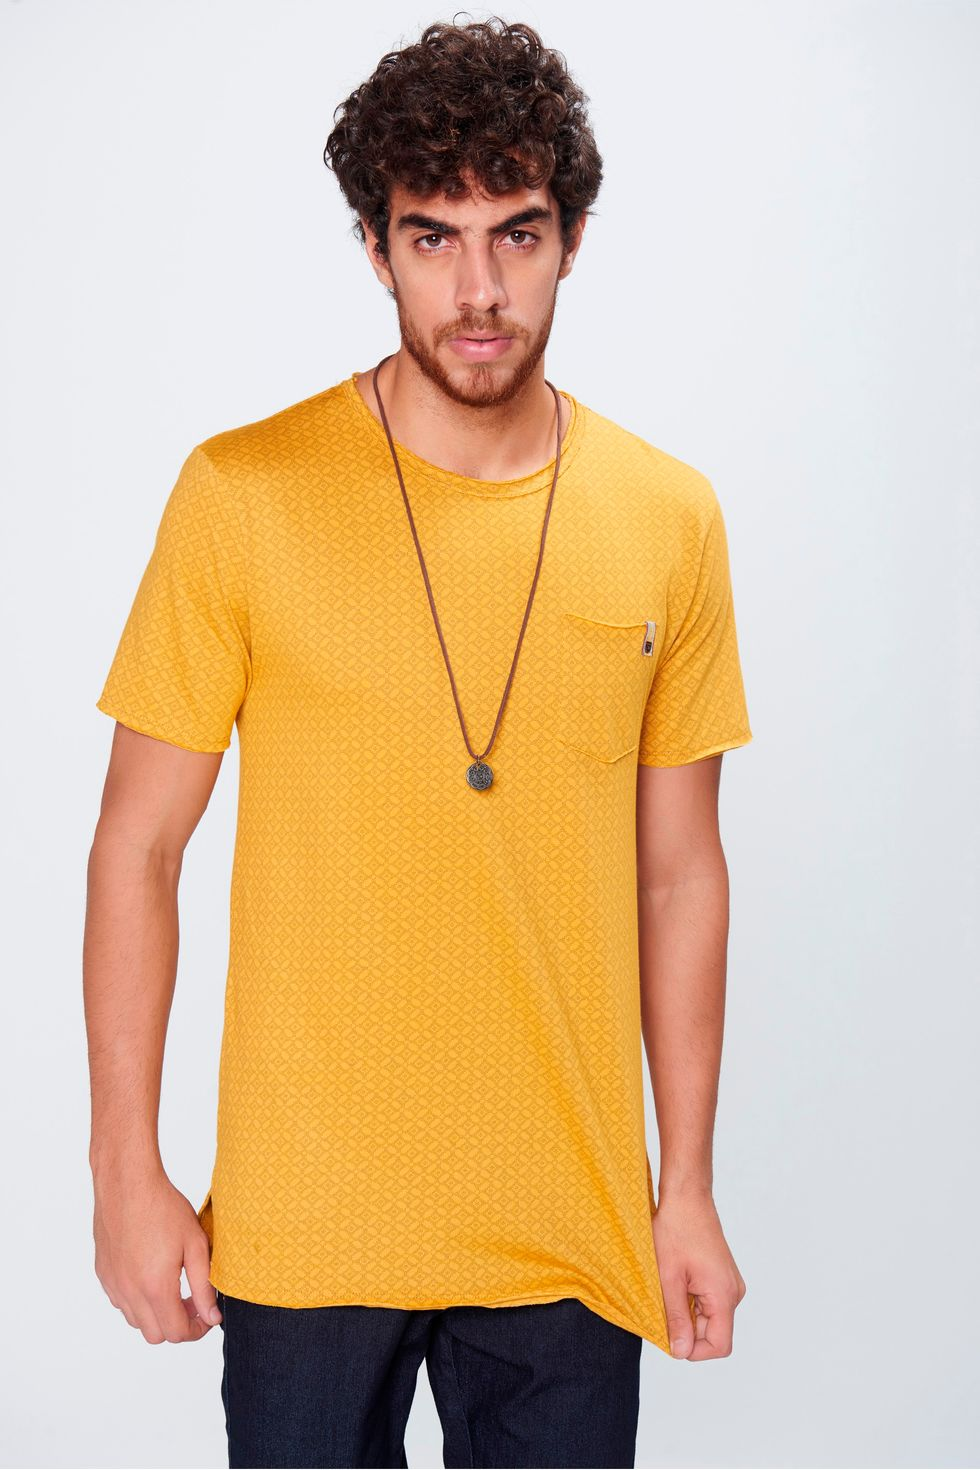 c5746cf94efb4 Camiseta Long Line Masculina - Damyller